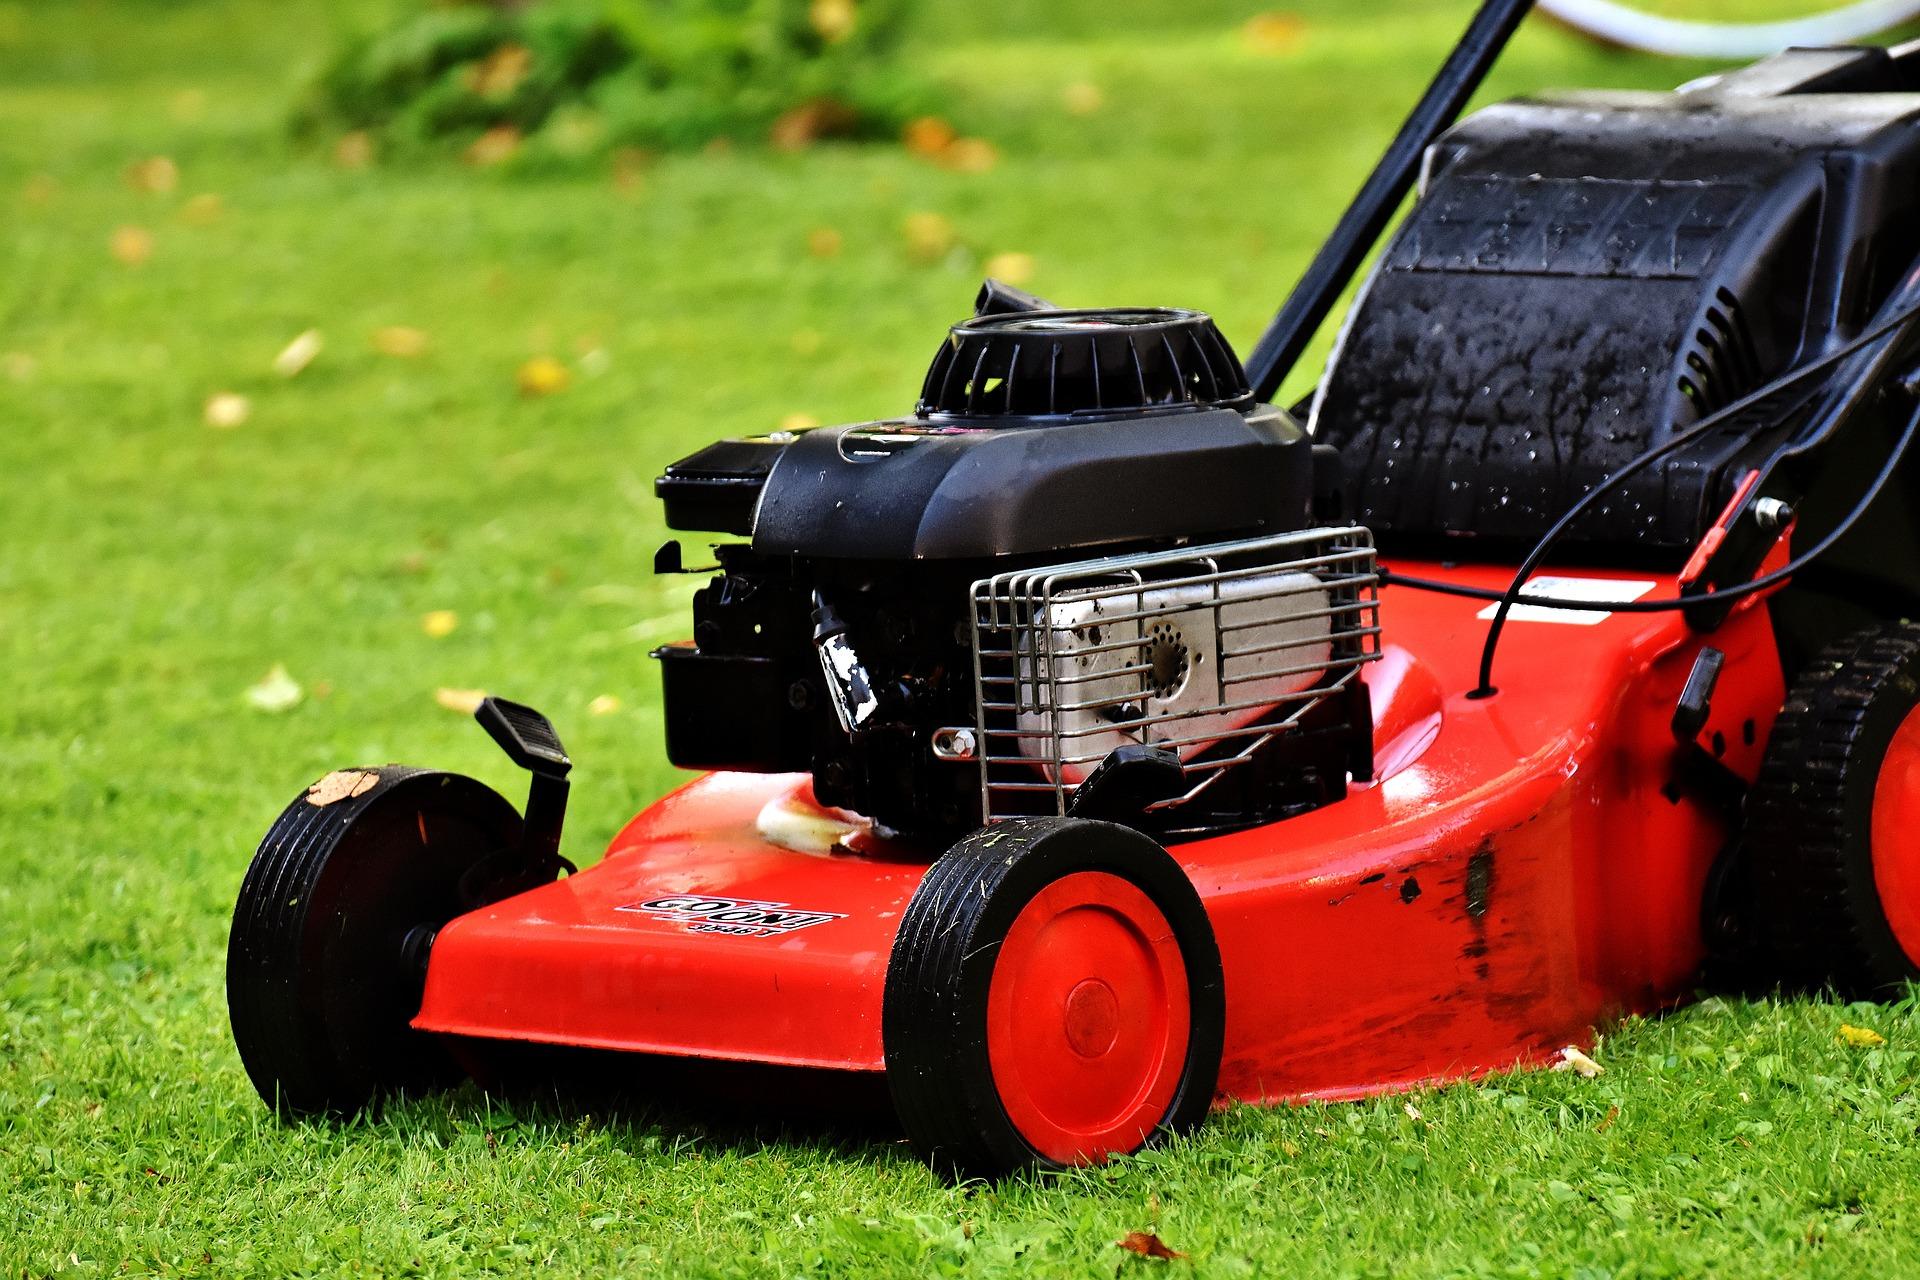 lawn-mower-2293876_1920